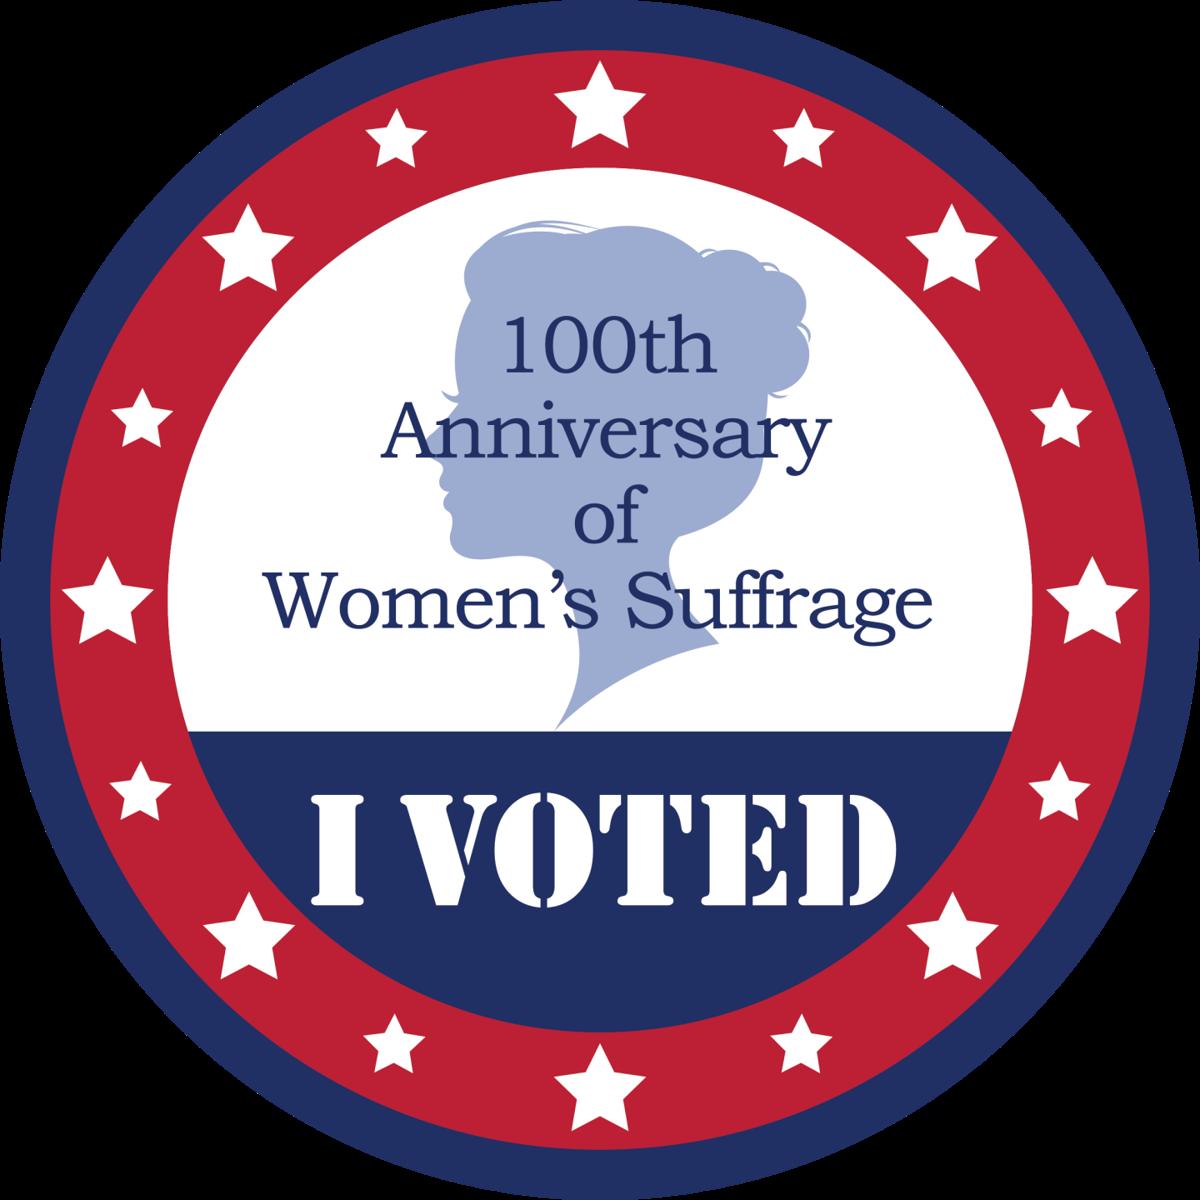 100th Anniversary of Women's Sufferage